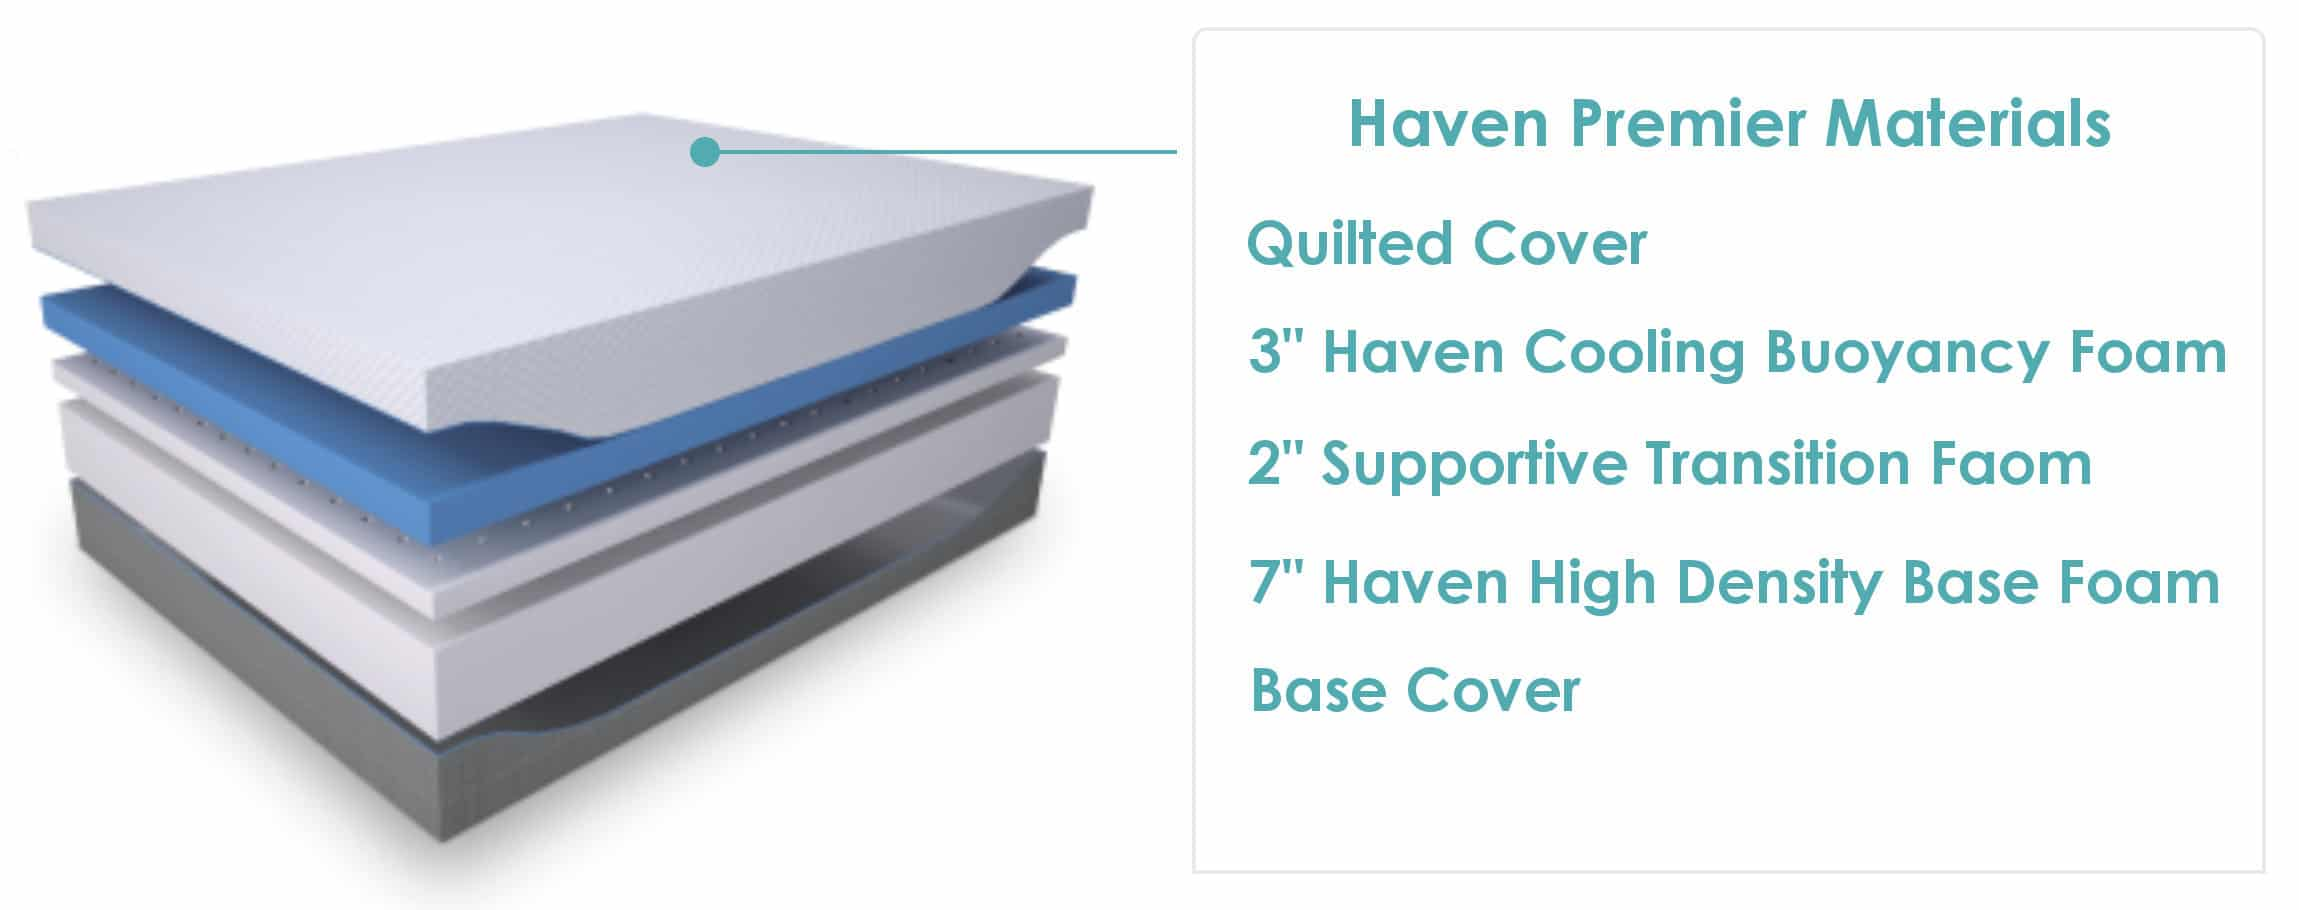 haven premier mattress materials